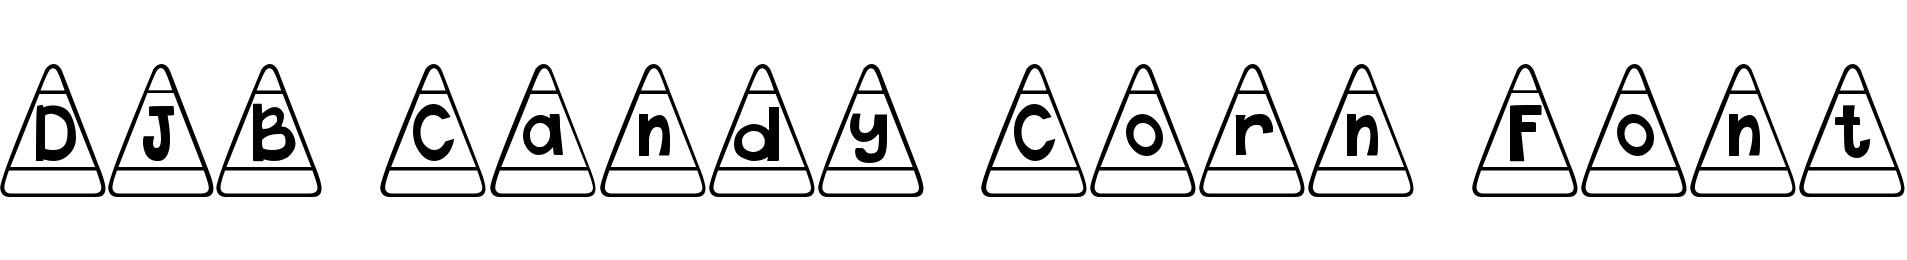 DJB Candy Corn Font